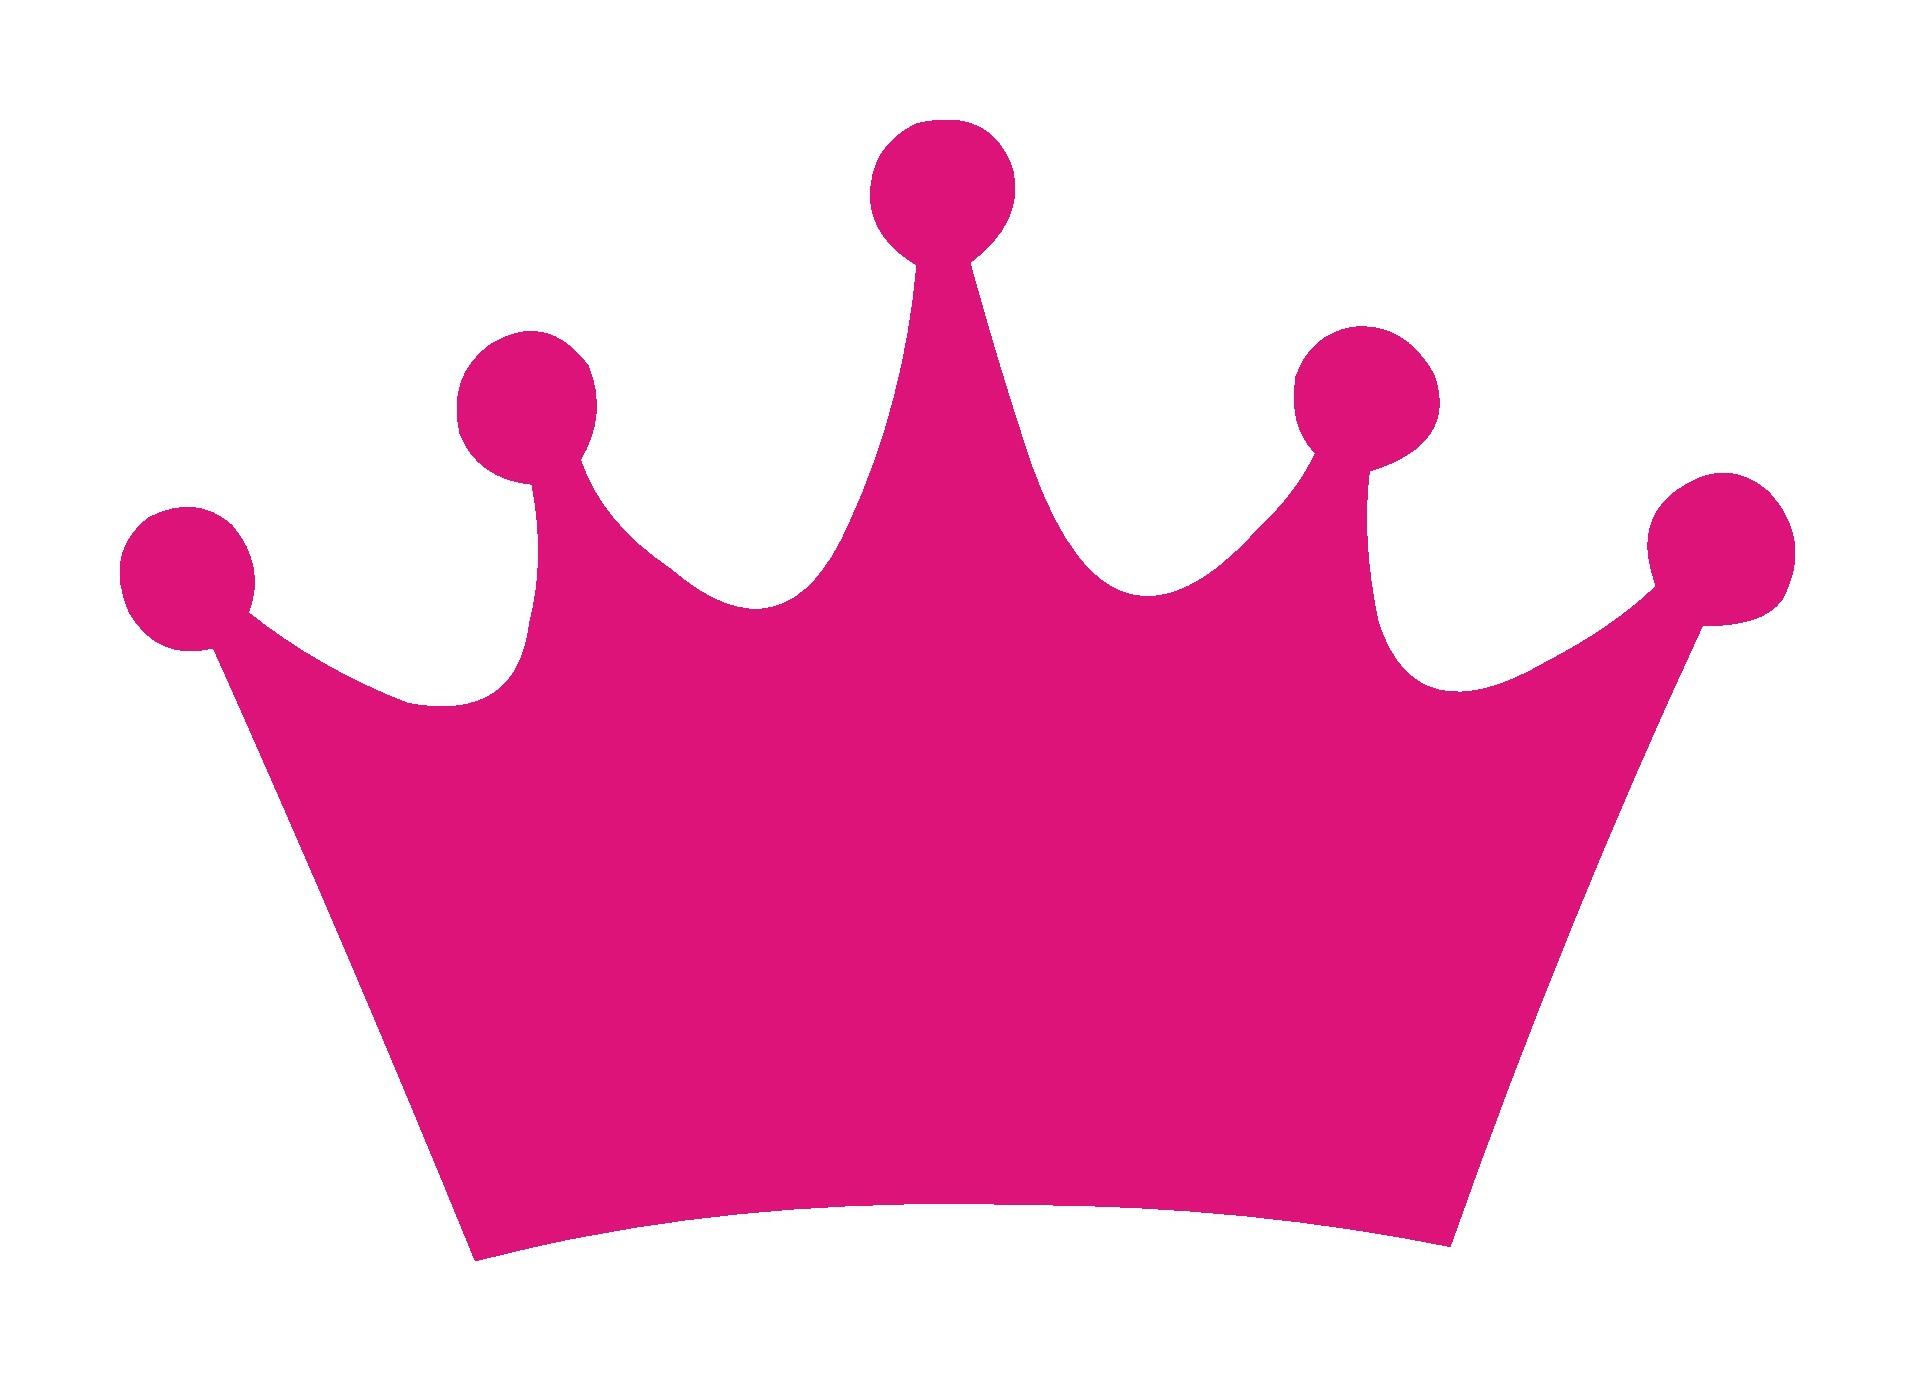 Princess crown clipart 15.